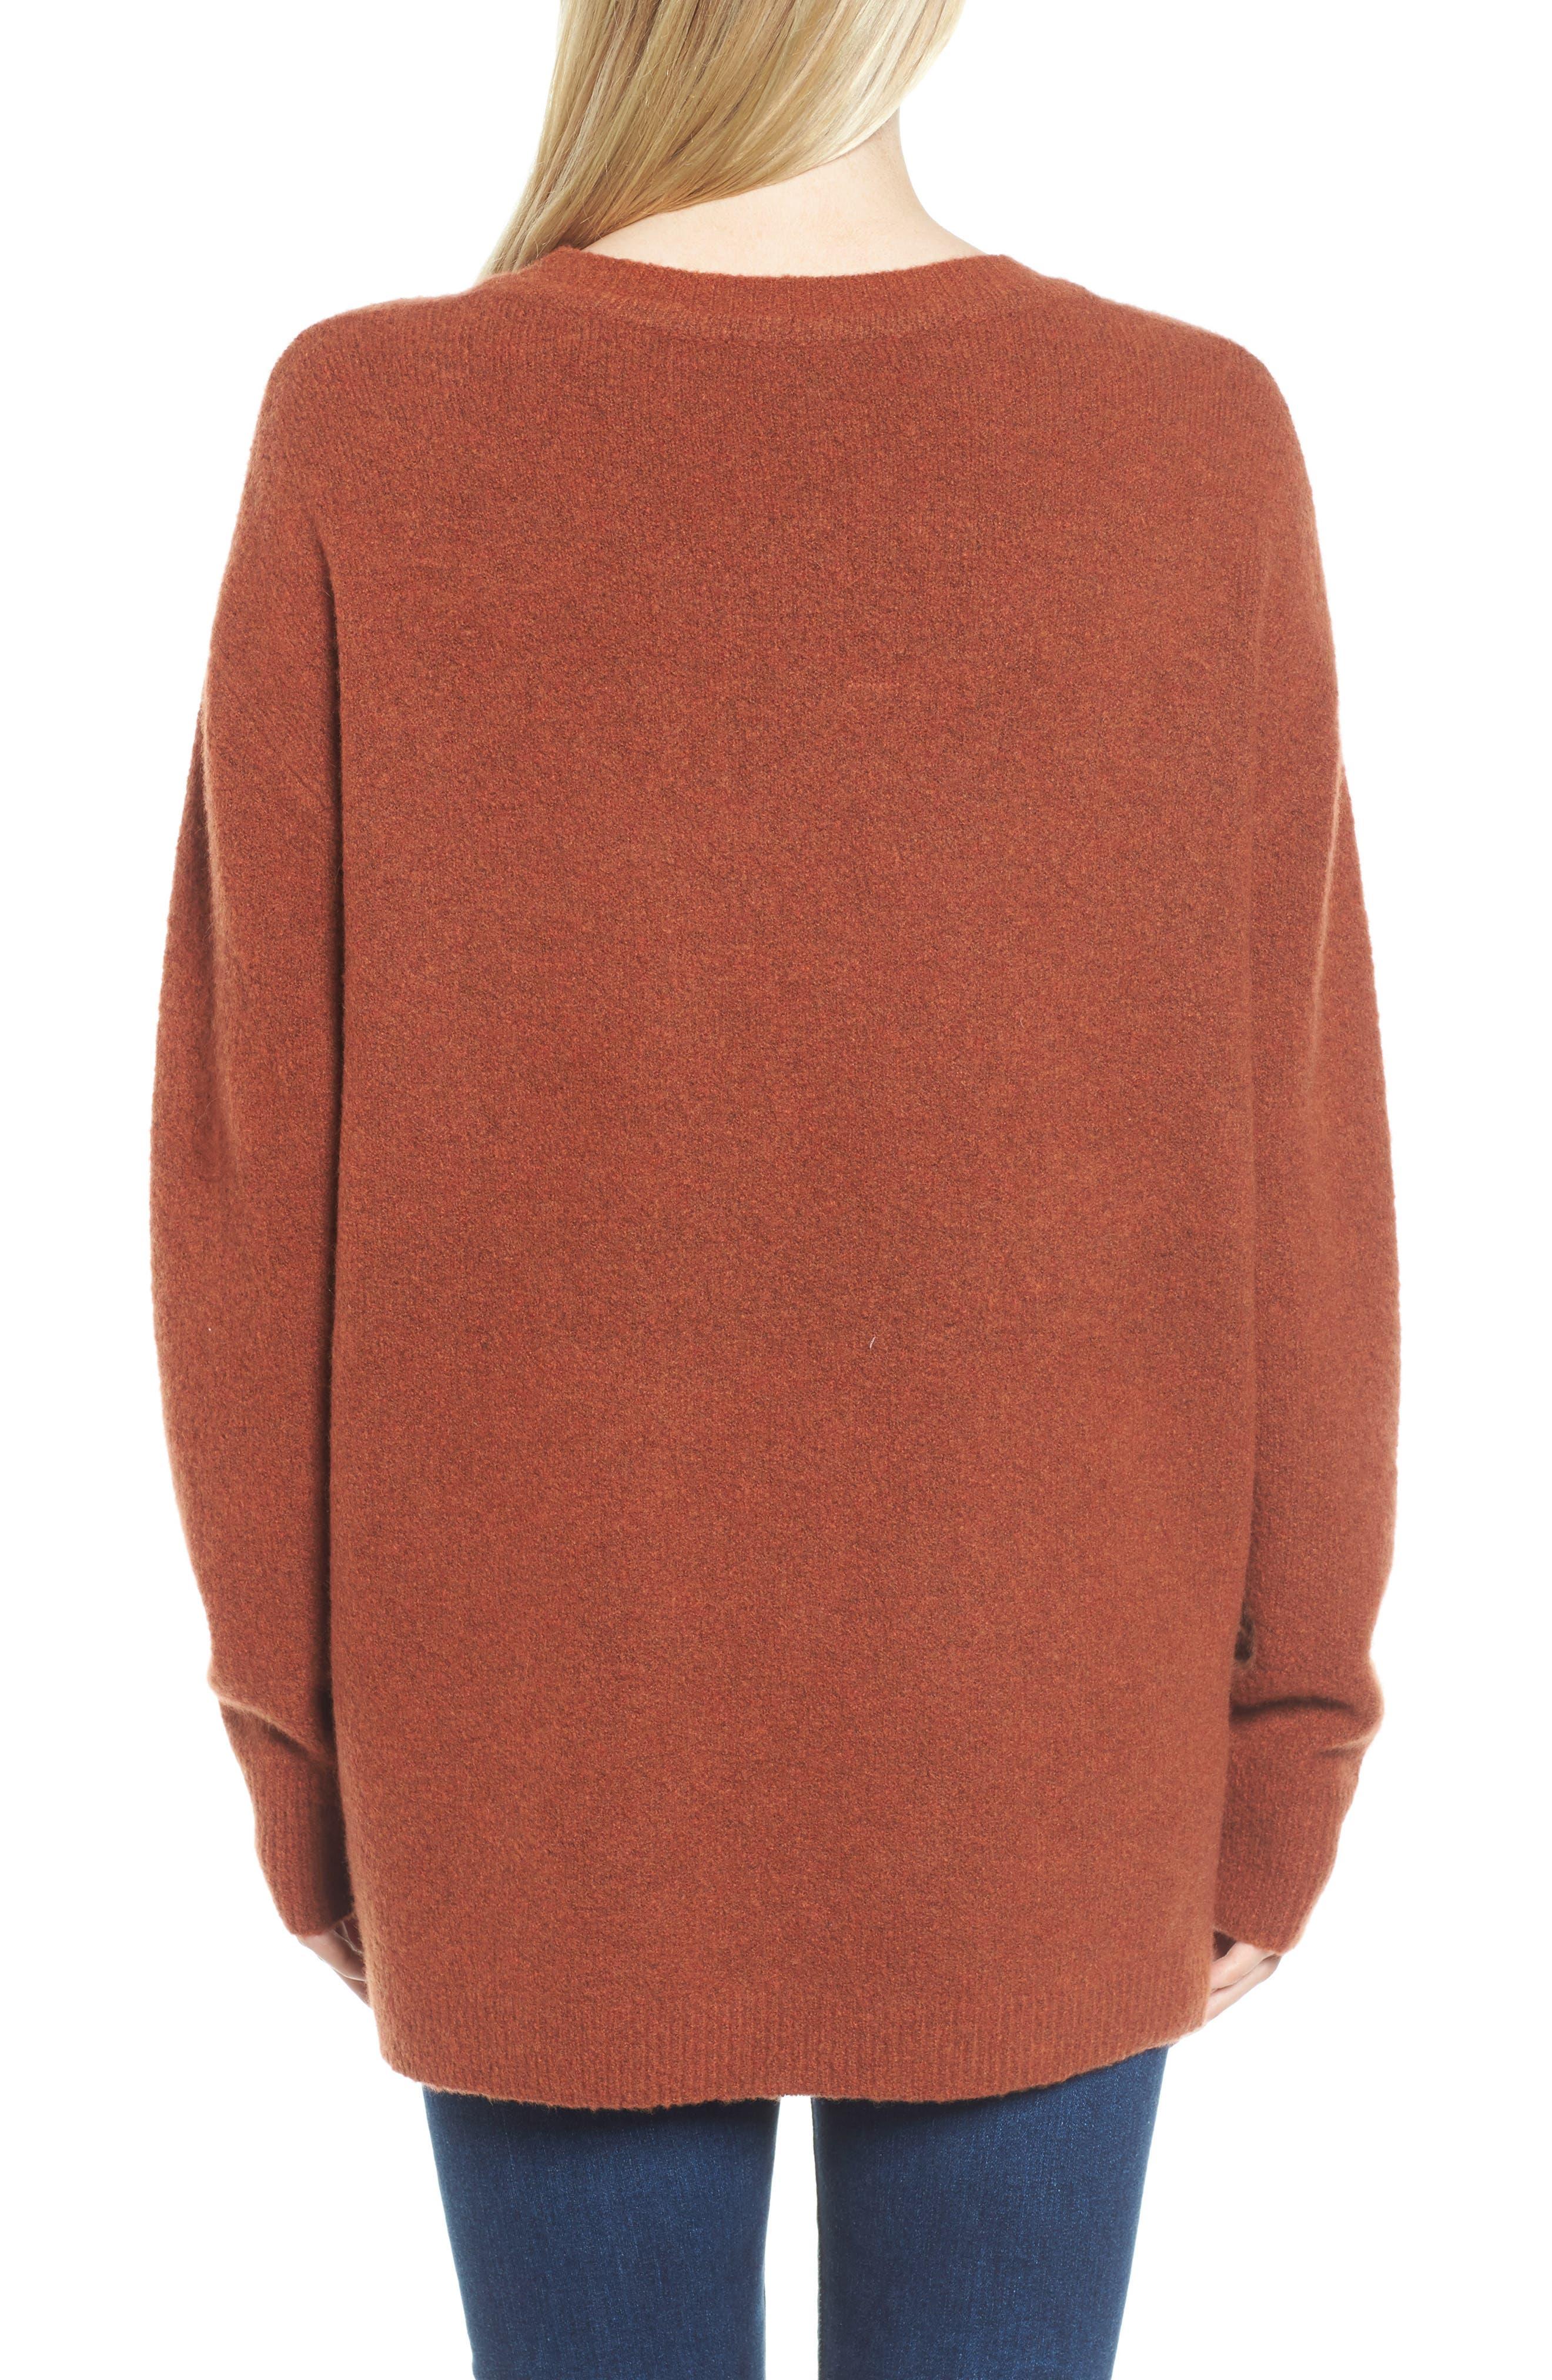 Alternate Image 2  - James Perse Oversize Cashmere Sweater